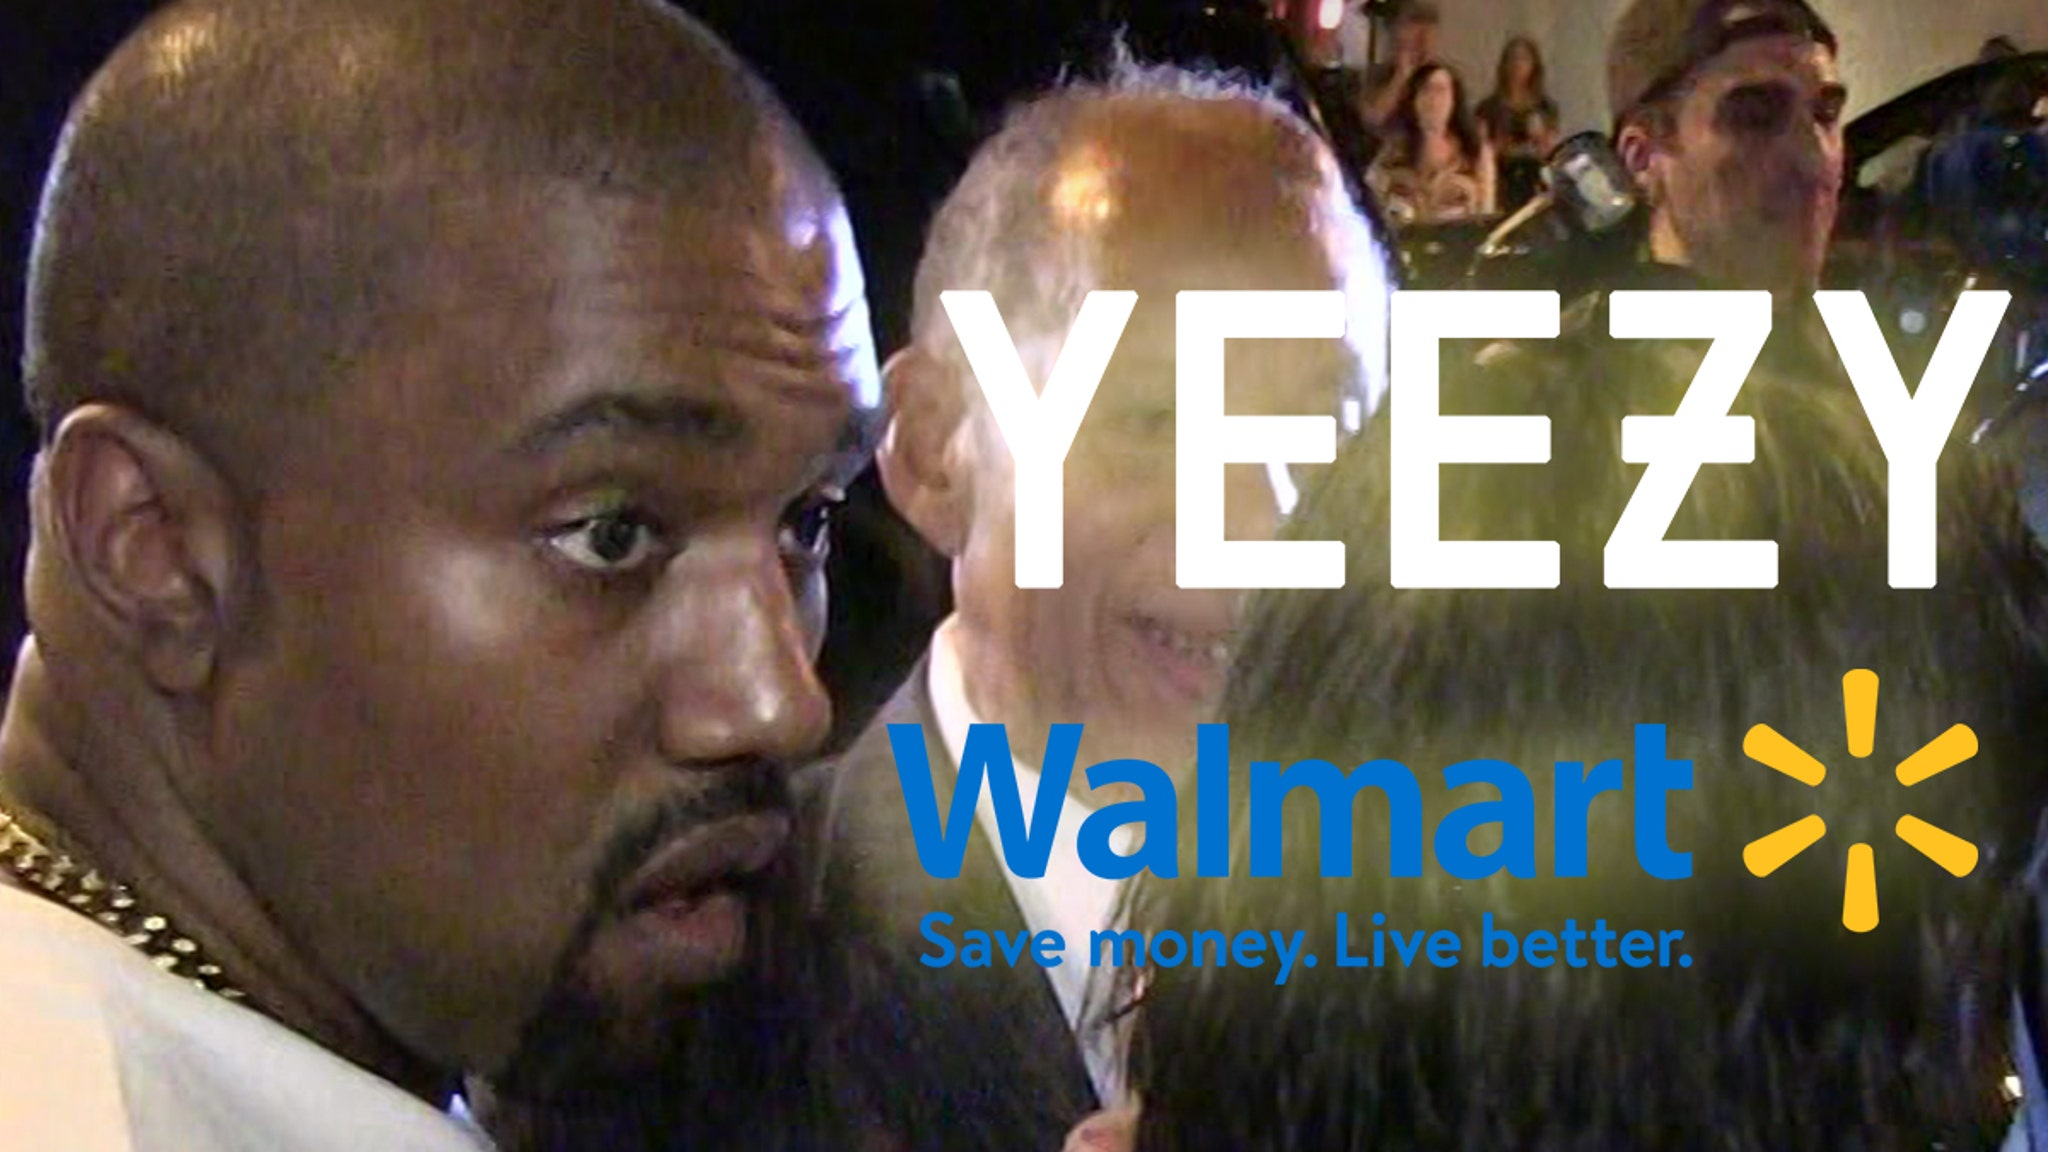 Kanye West & Yeezy Sue Walmart for Foam Runner Shoe Rip-Off - TMZ